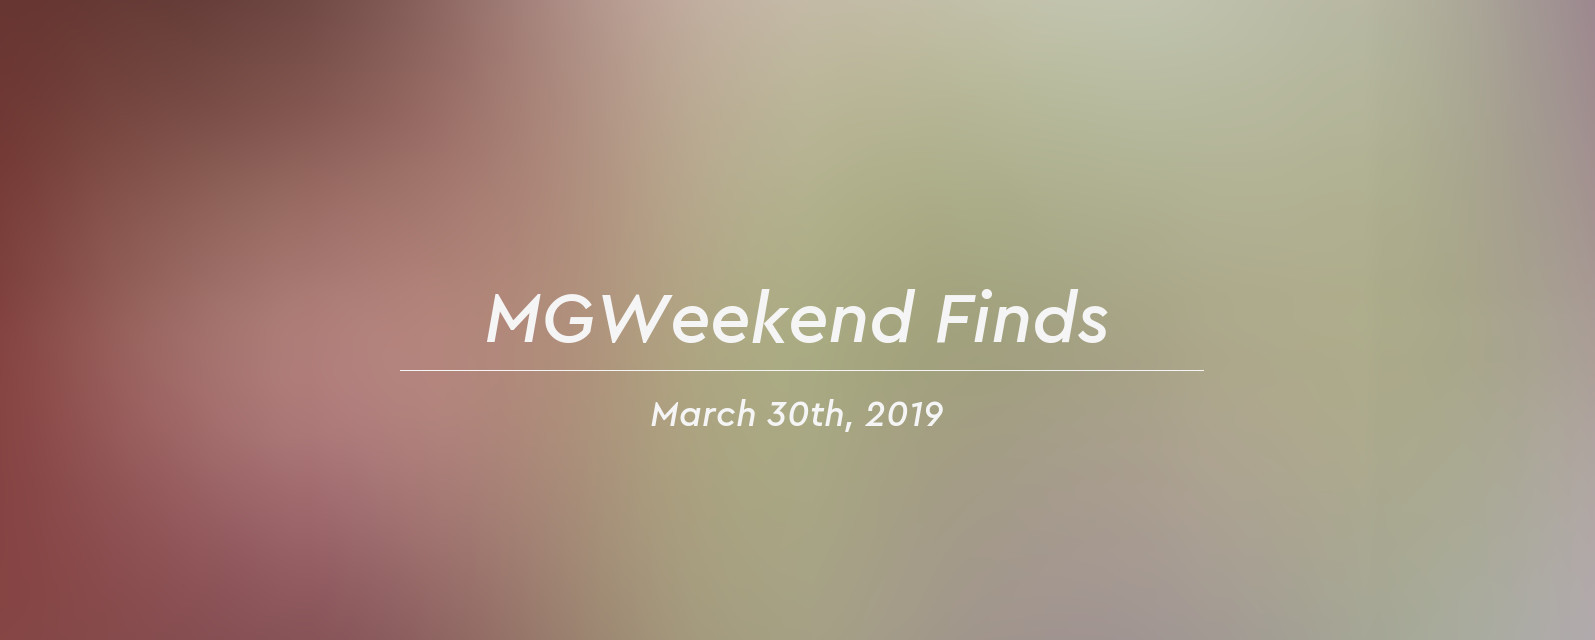 mgw finds 2019 03 30 header